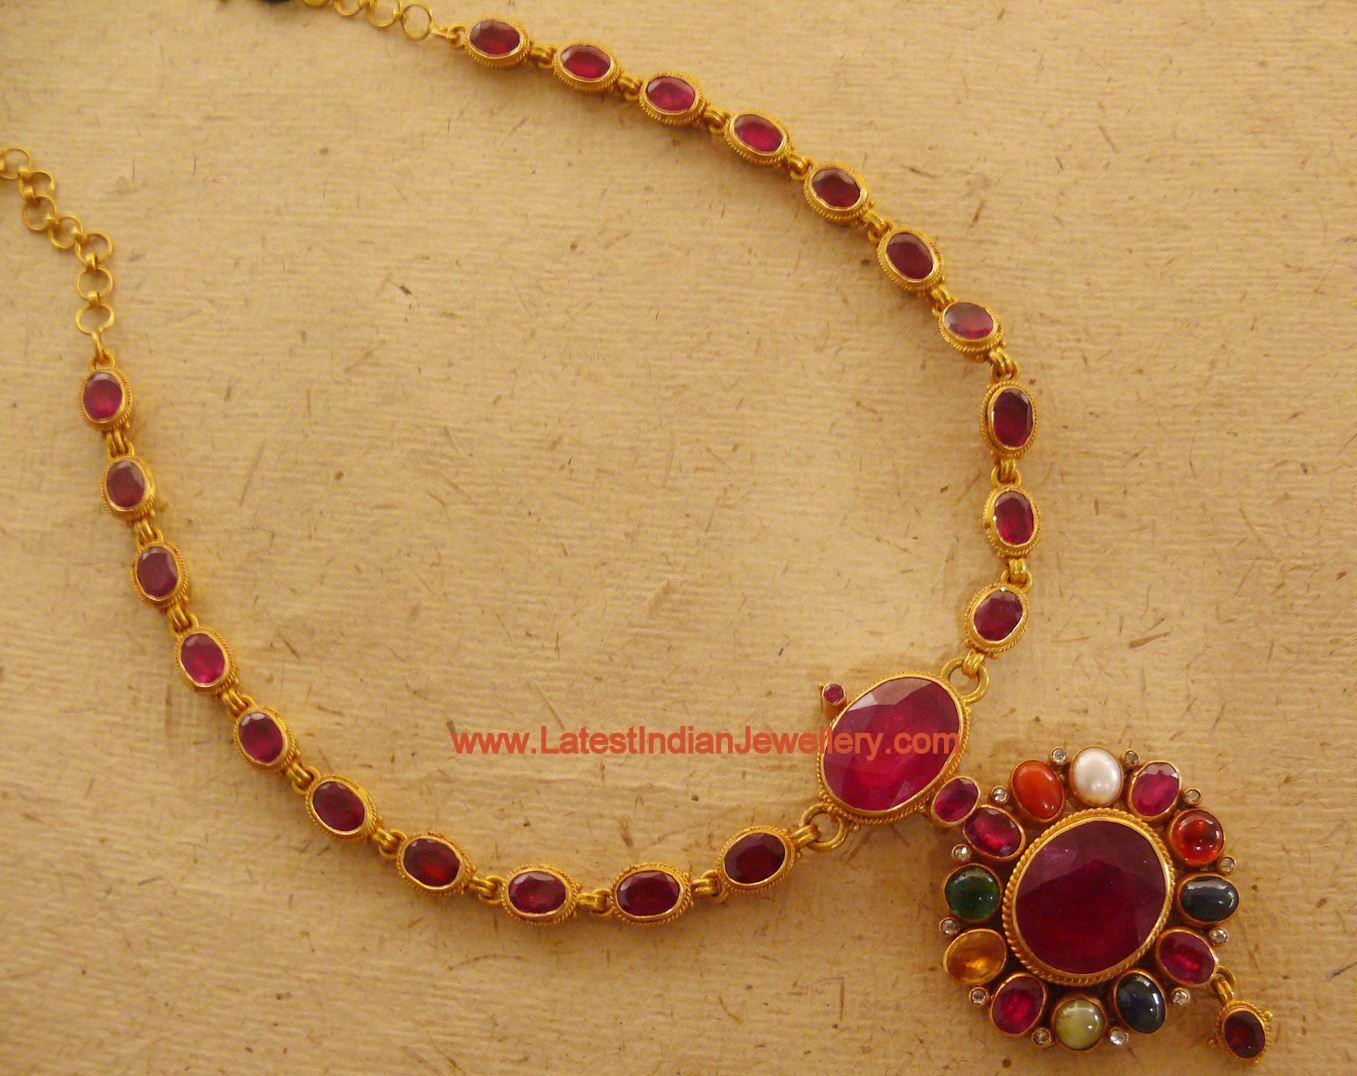 High Quality Pota Ruby Necklace With Navaratna Pendant